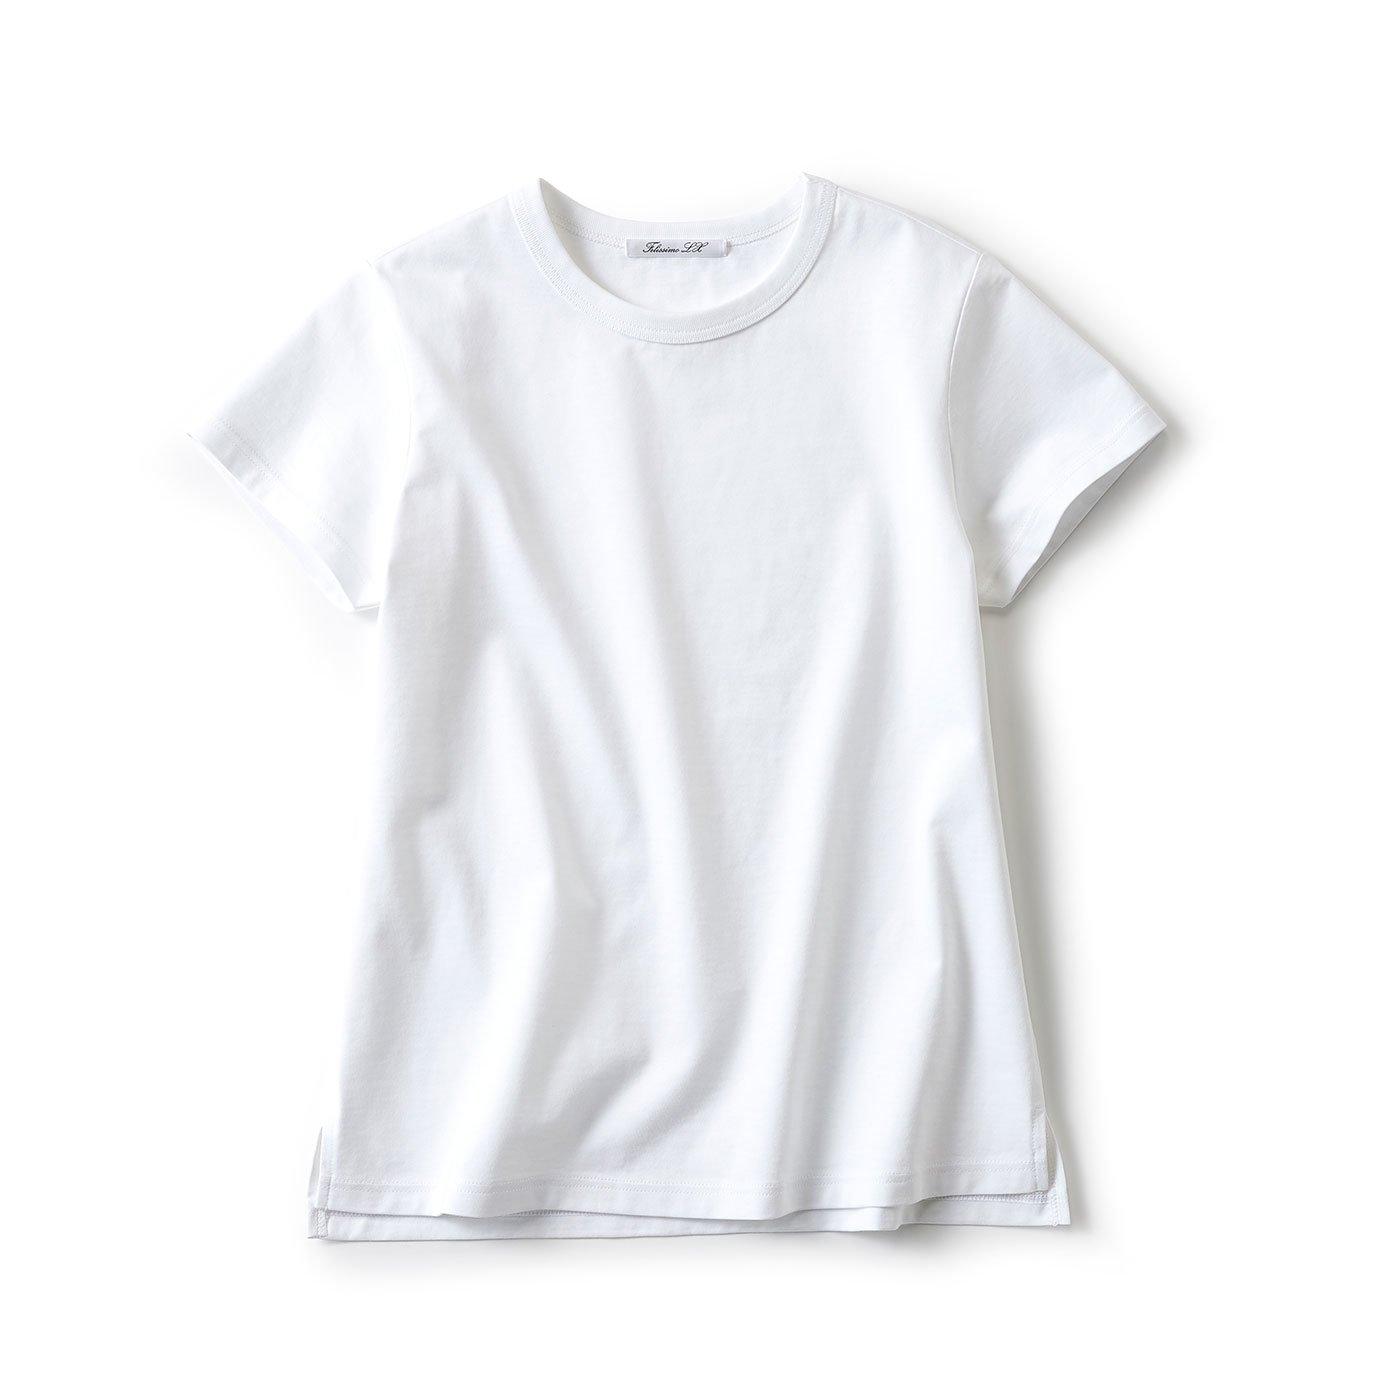 LX 大人女性の今が輝く 理想のTシャツ(ホワイト)